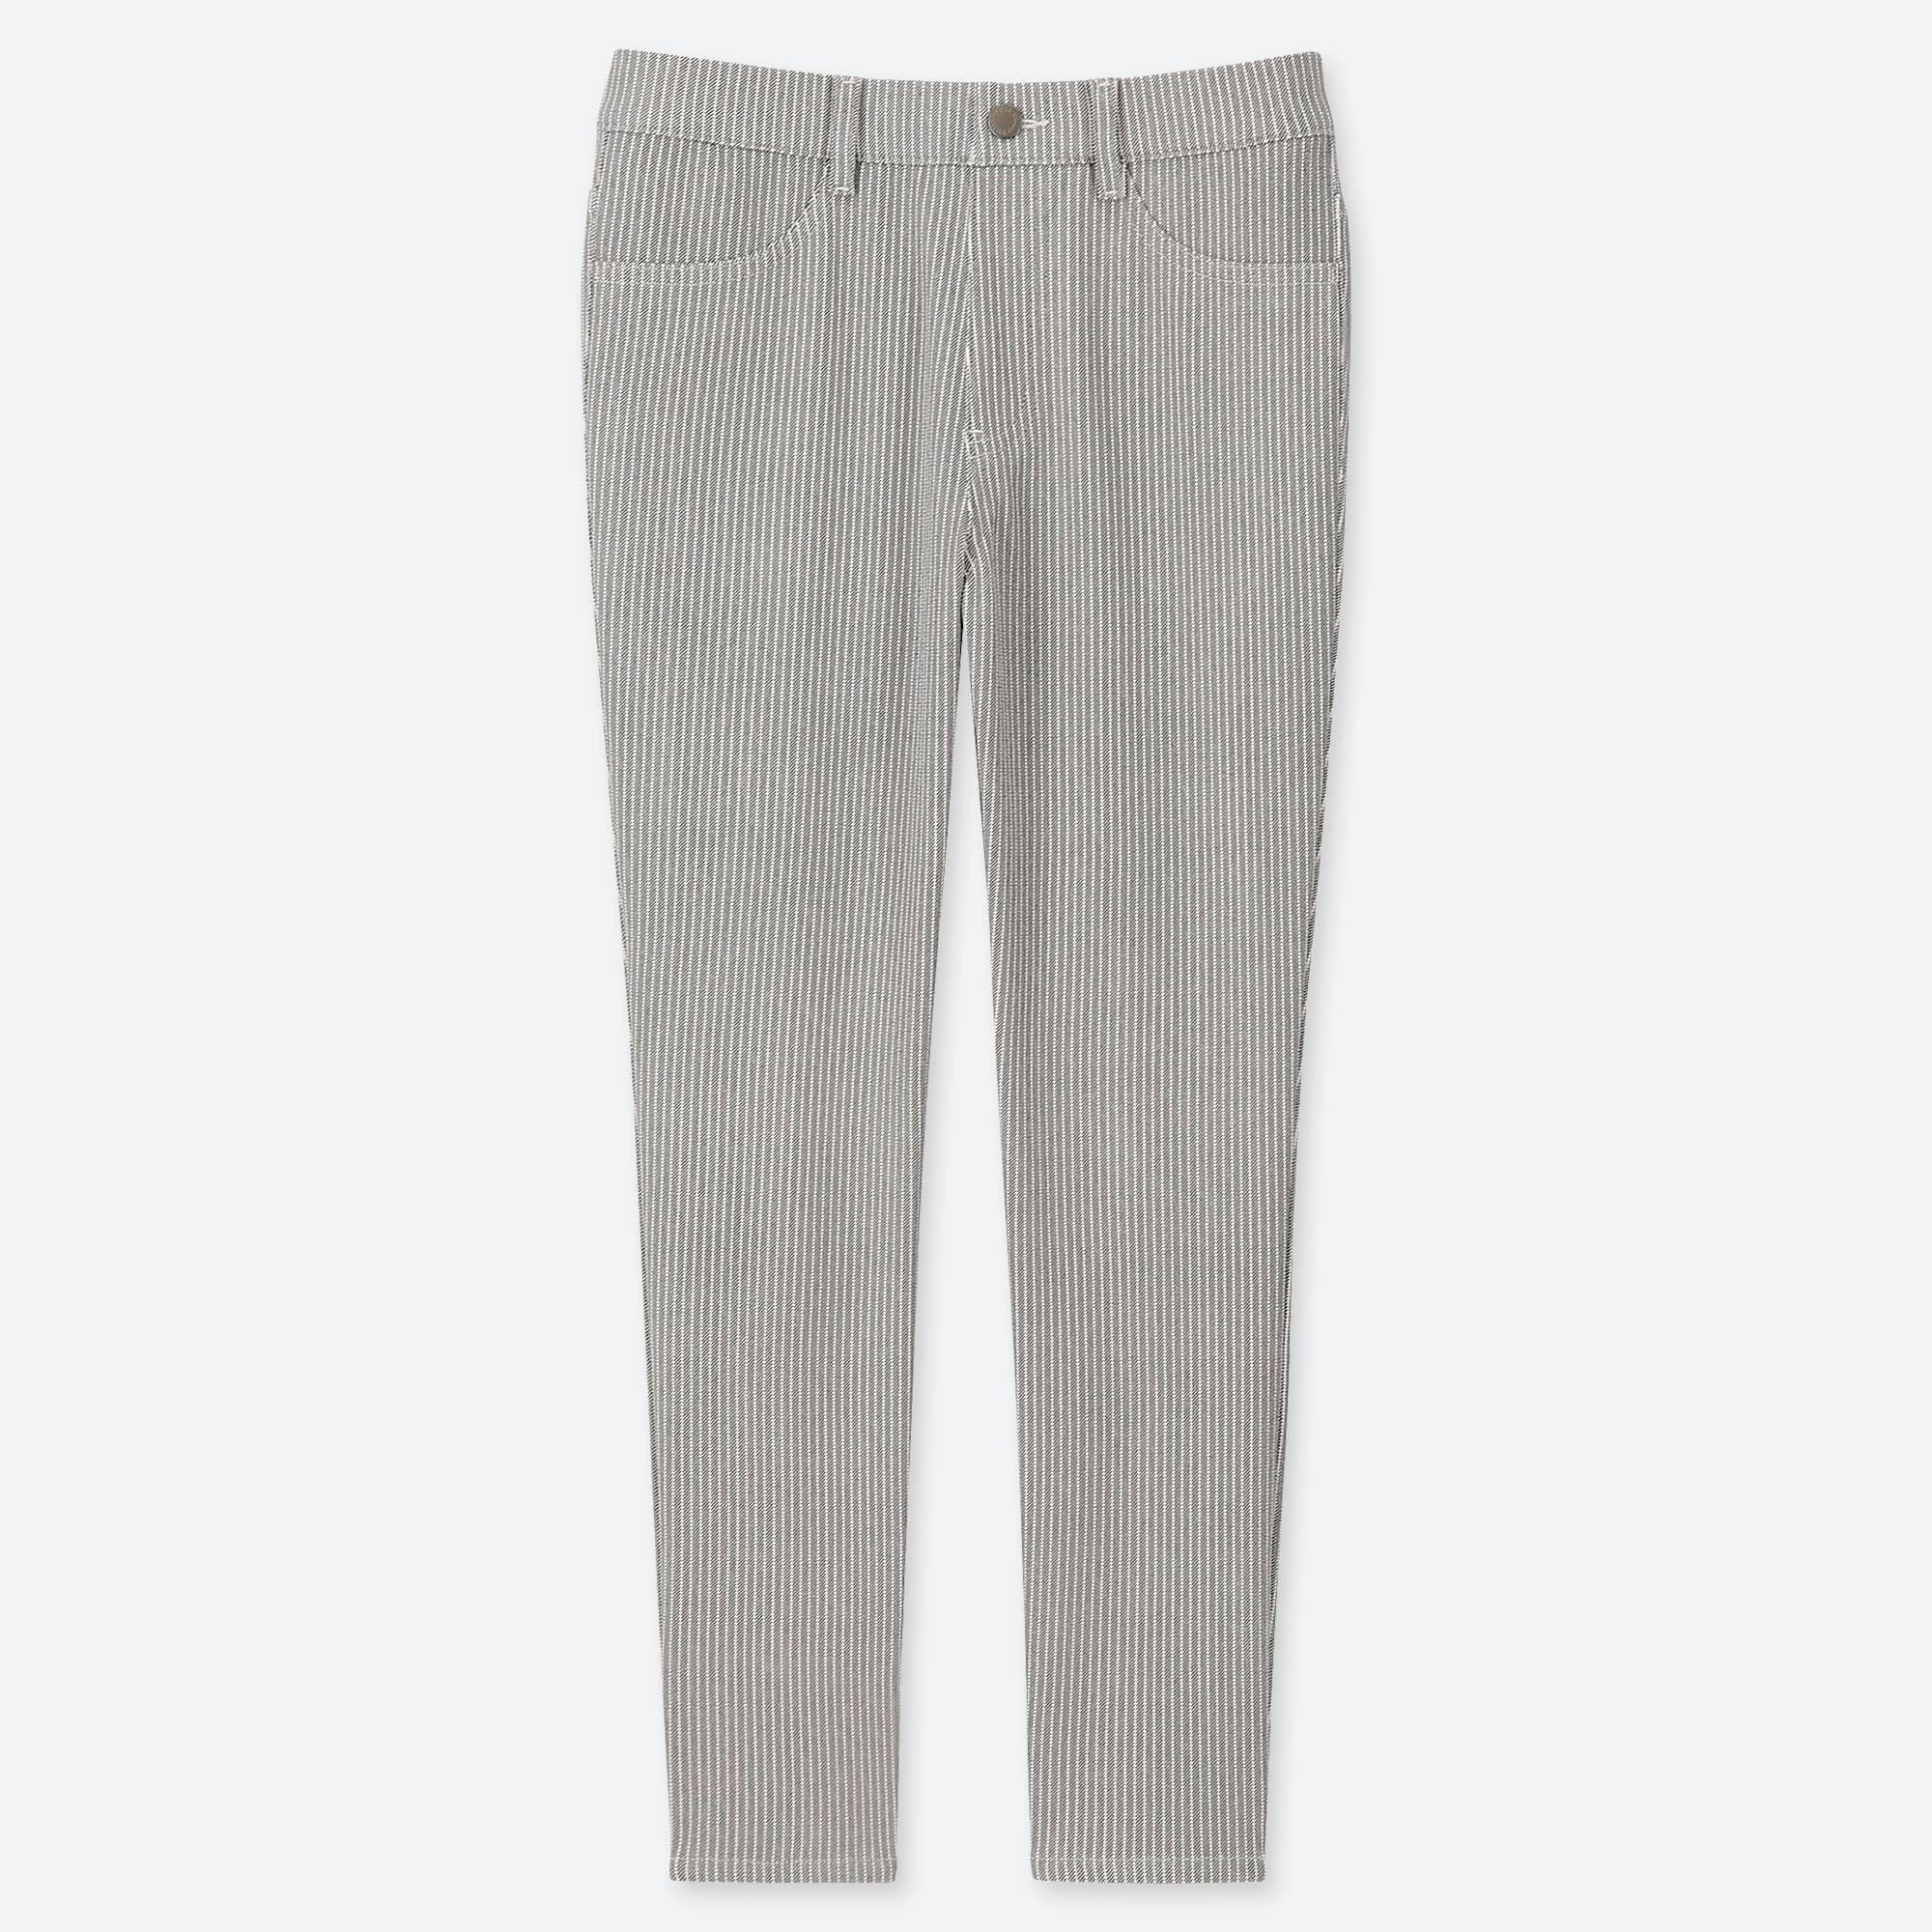 1f10e30edea9 Lyst - Uniqlo Women Ultra Stretch Print Cropped LEGGINGS Pants in Gray